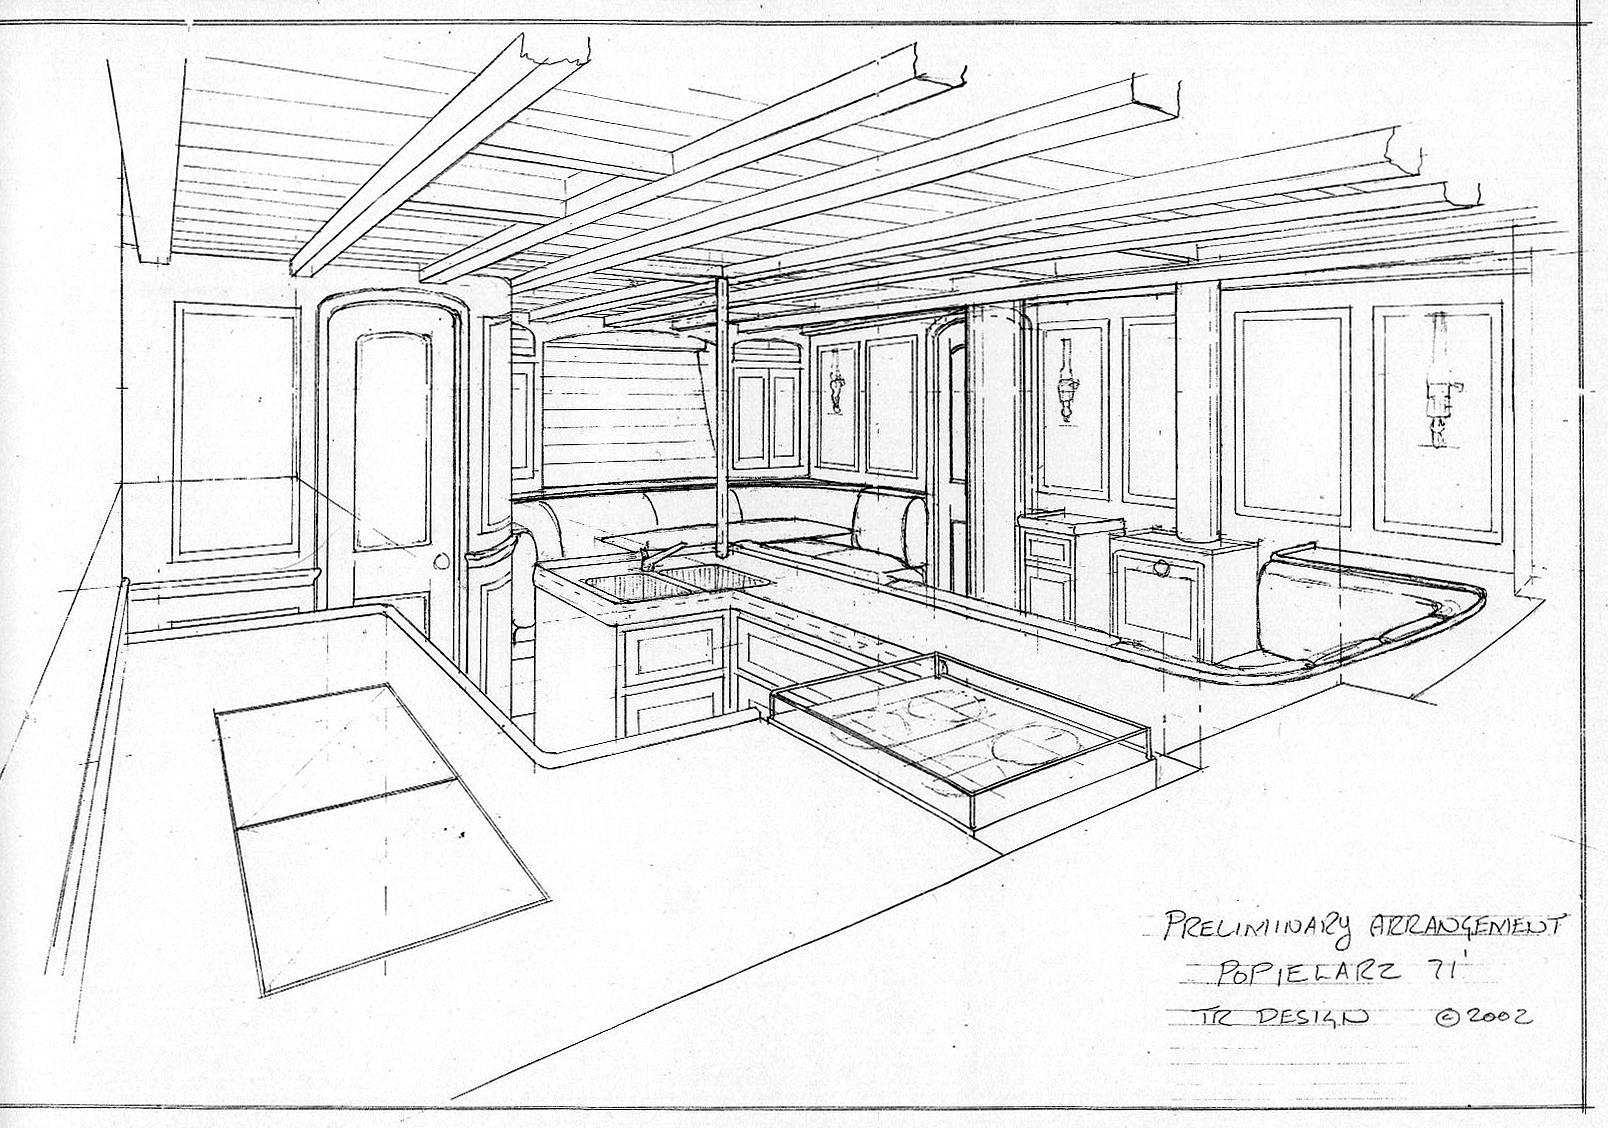 Drawn amd interior design Yacht Net Boat Design Popsaloon